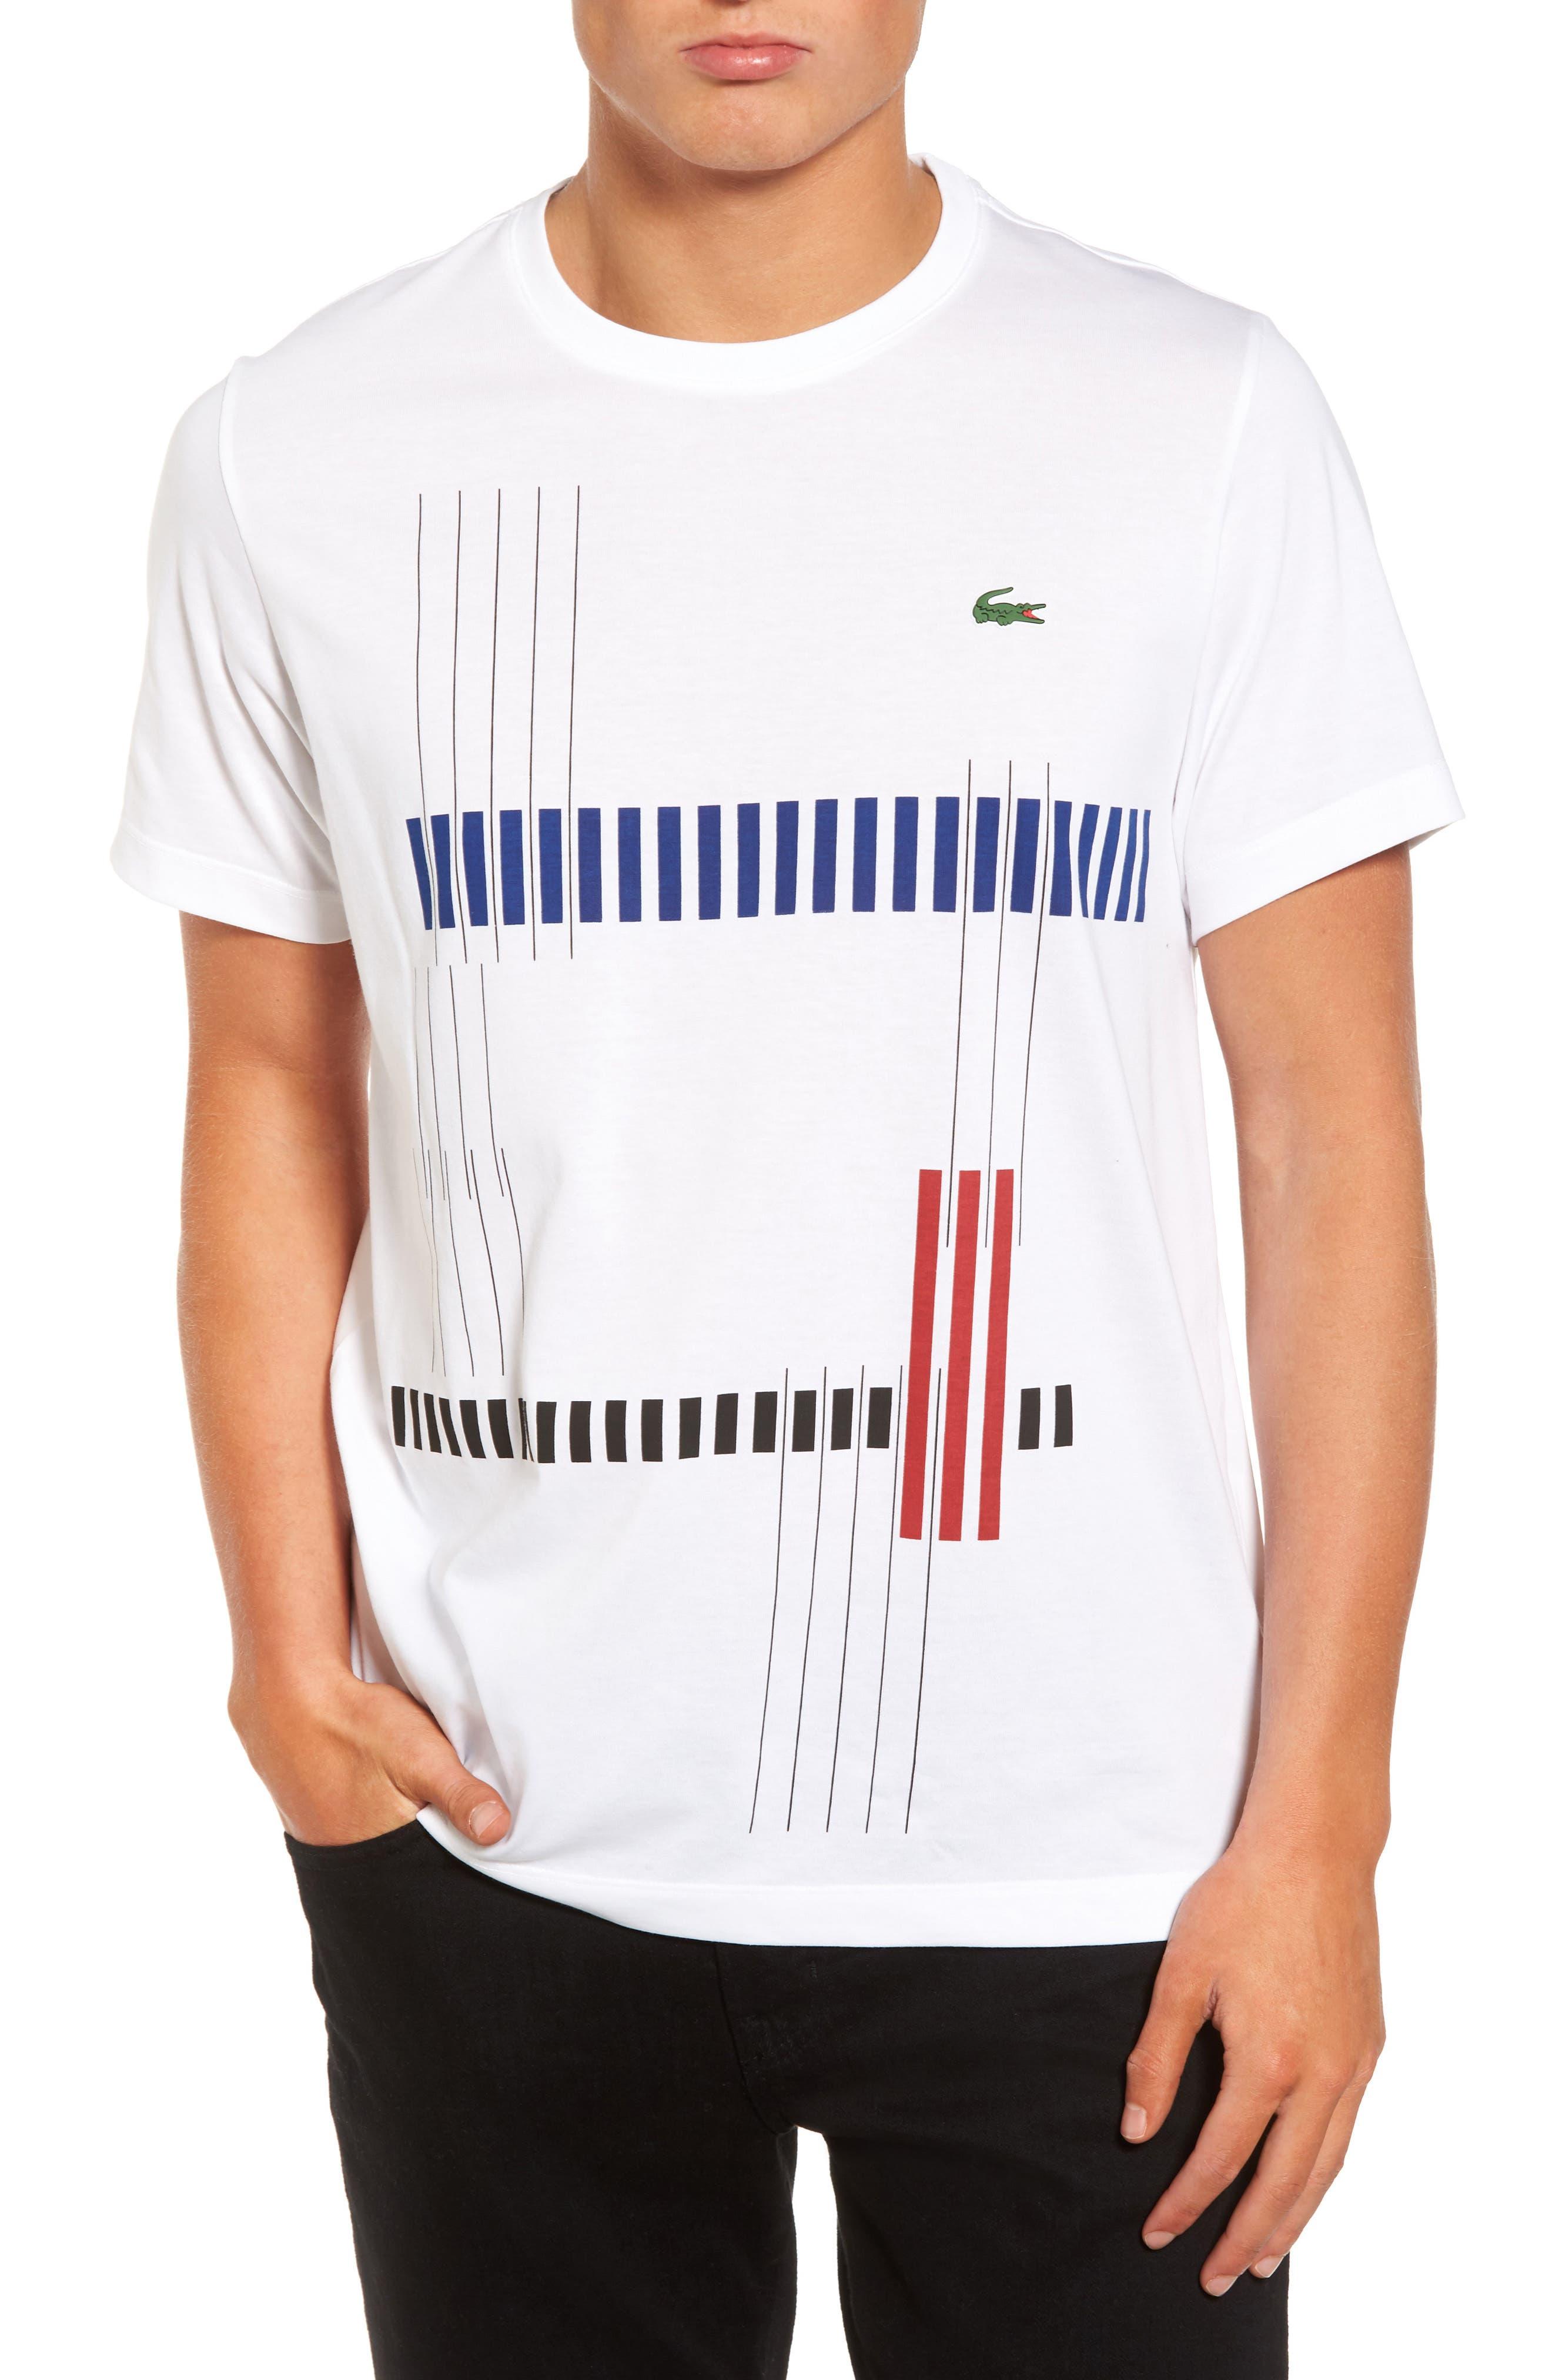 Main Image - Lacoste Tech Vertical Stripe Graphic T-Shirt